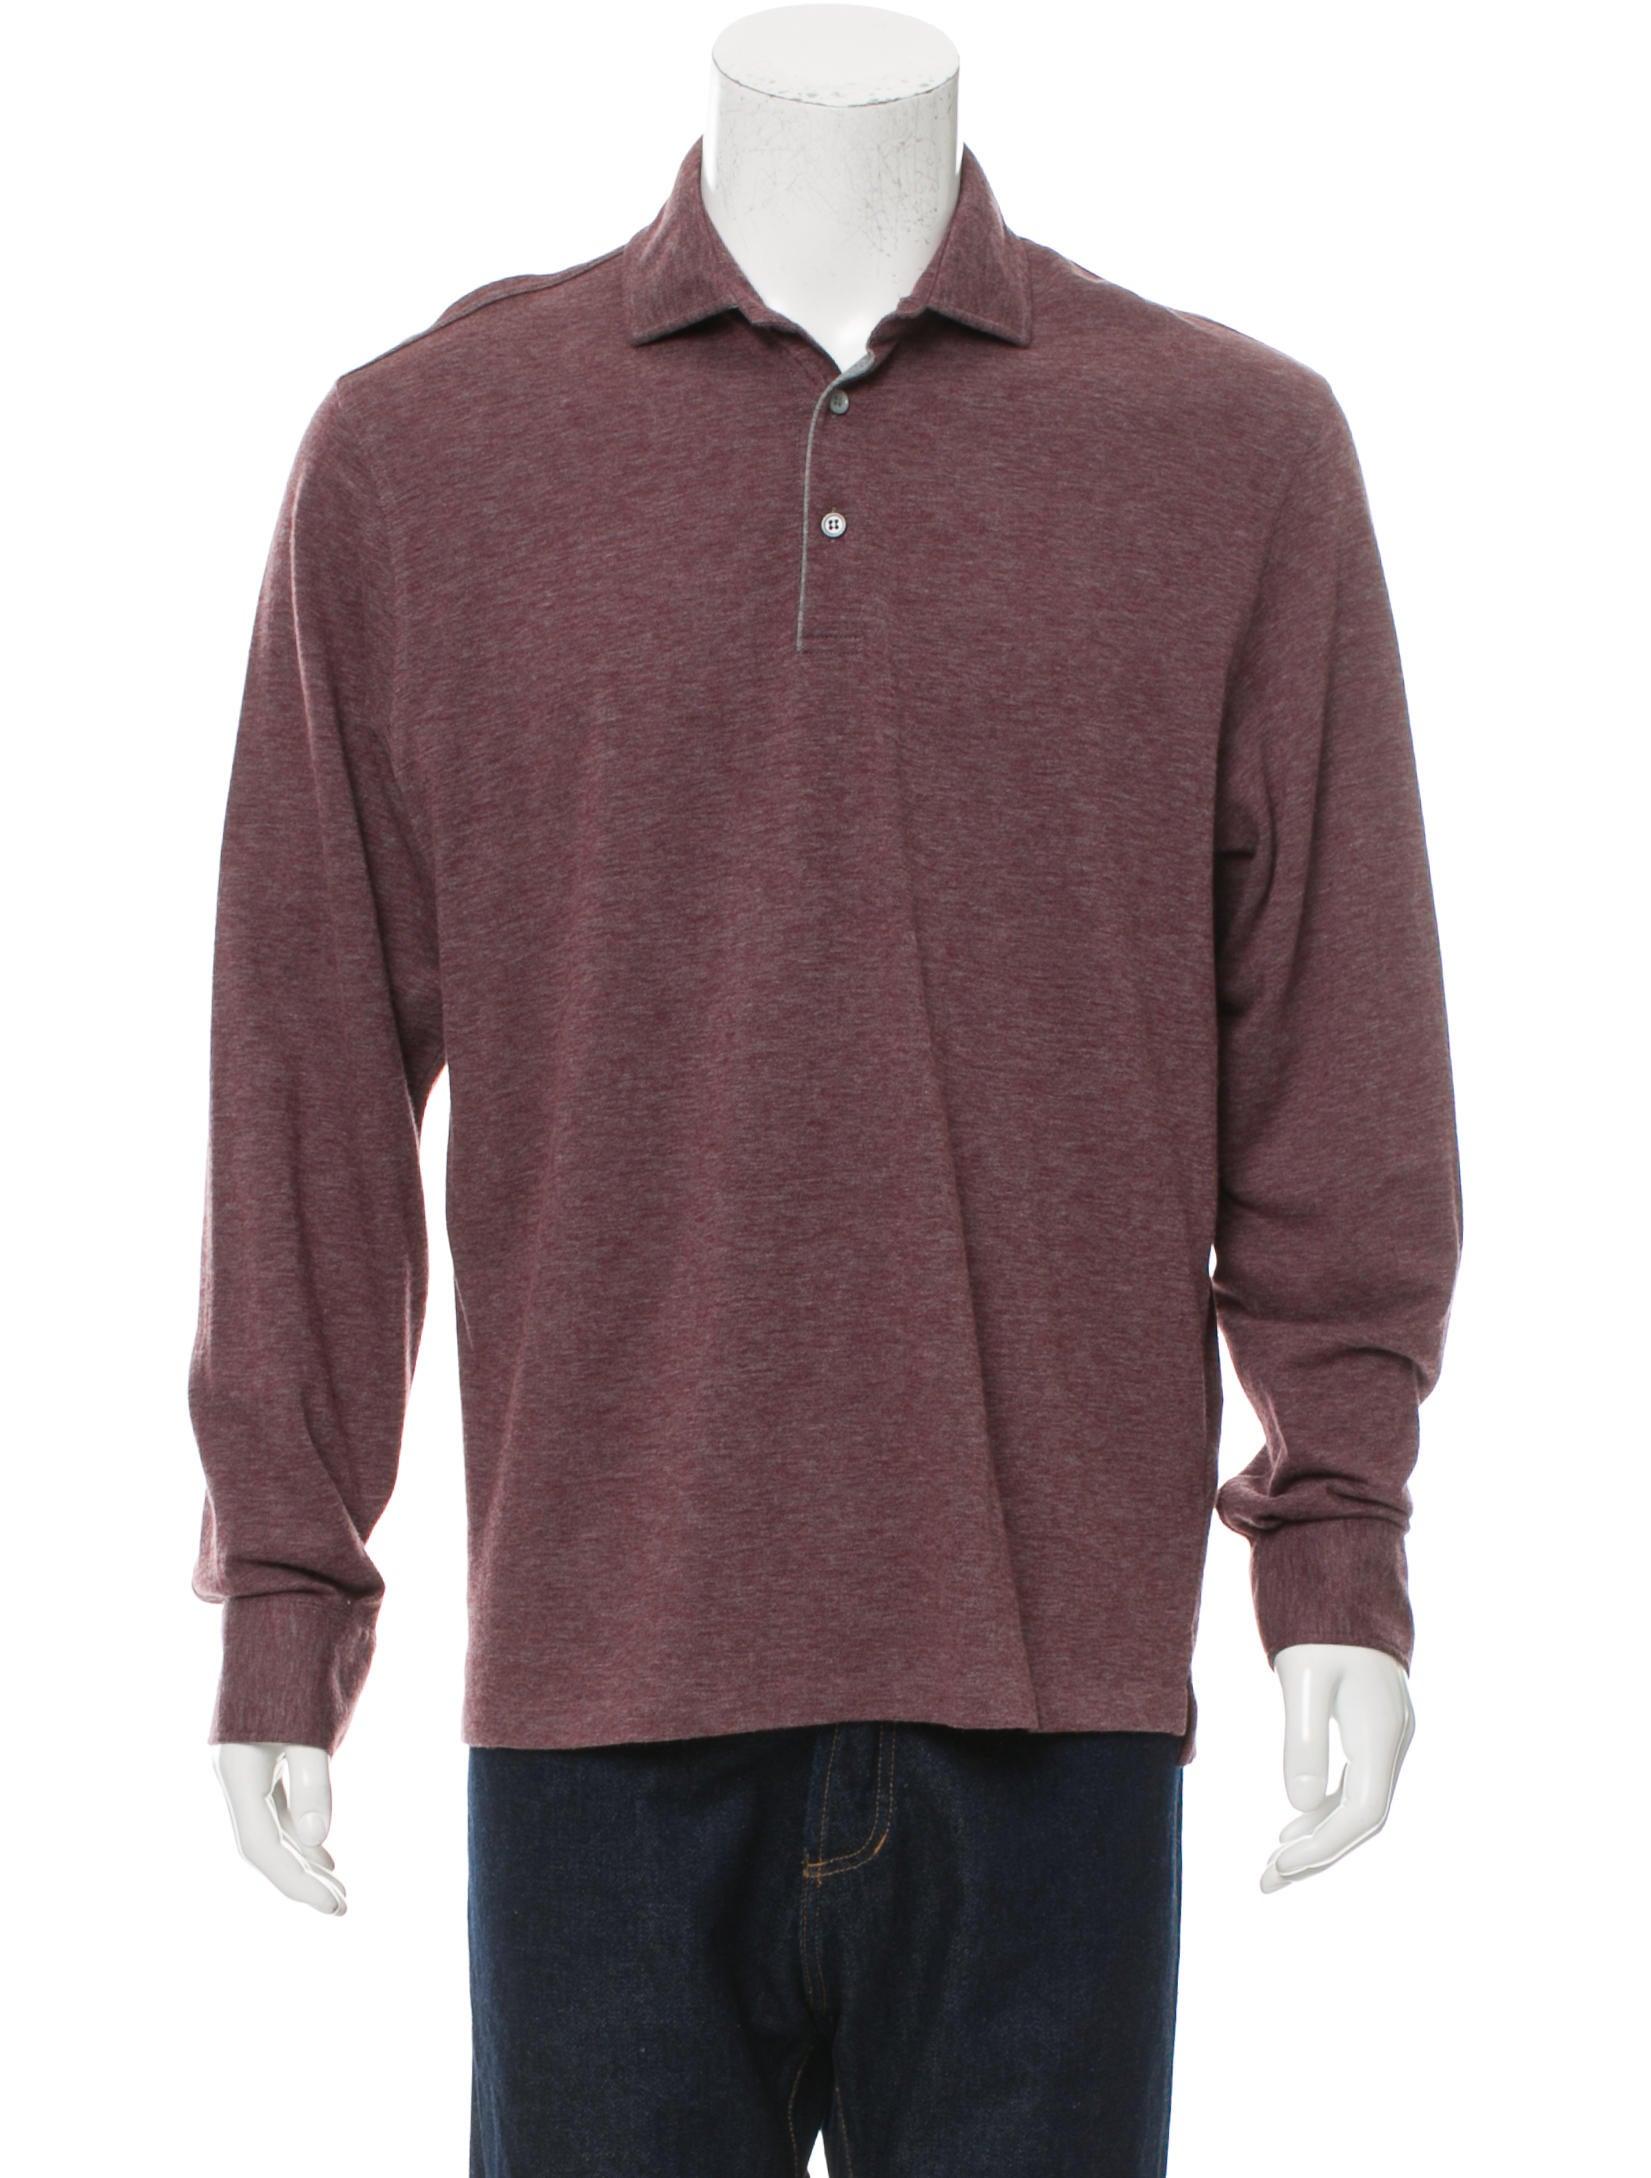 Ermenegildo zegna long sleeve polo shirt clothing for Zegna polo shirts sale